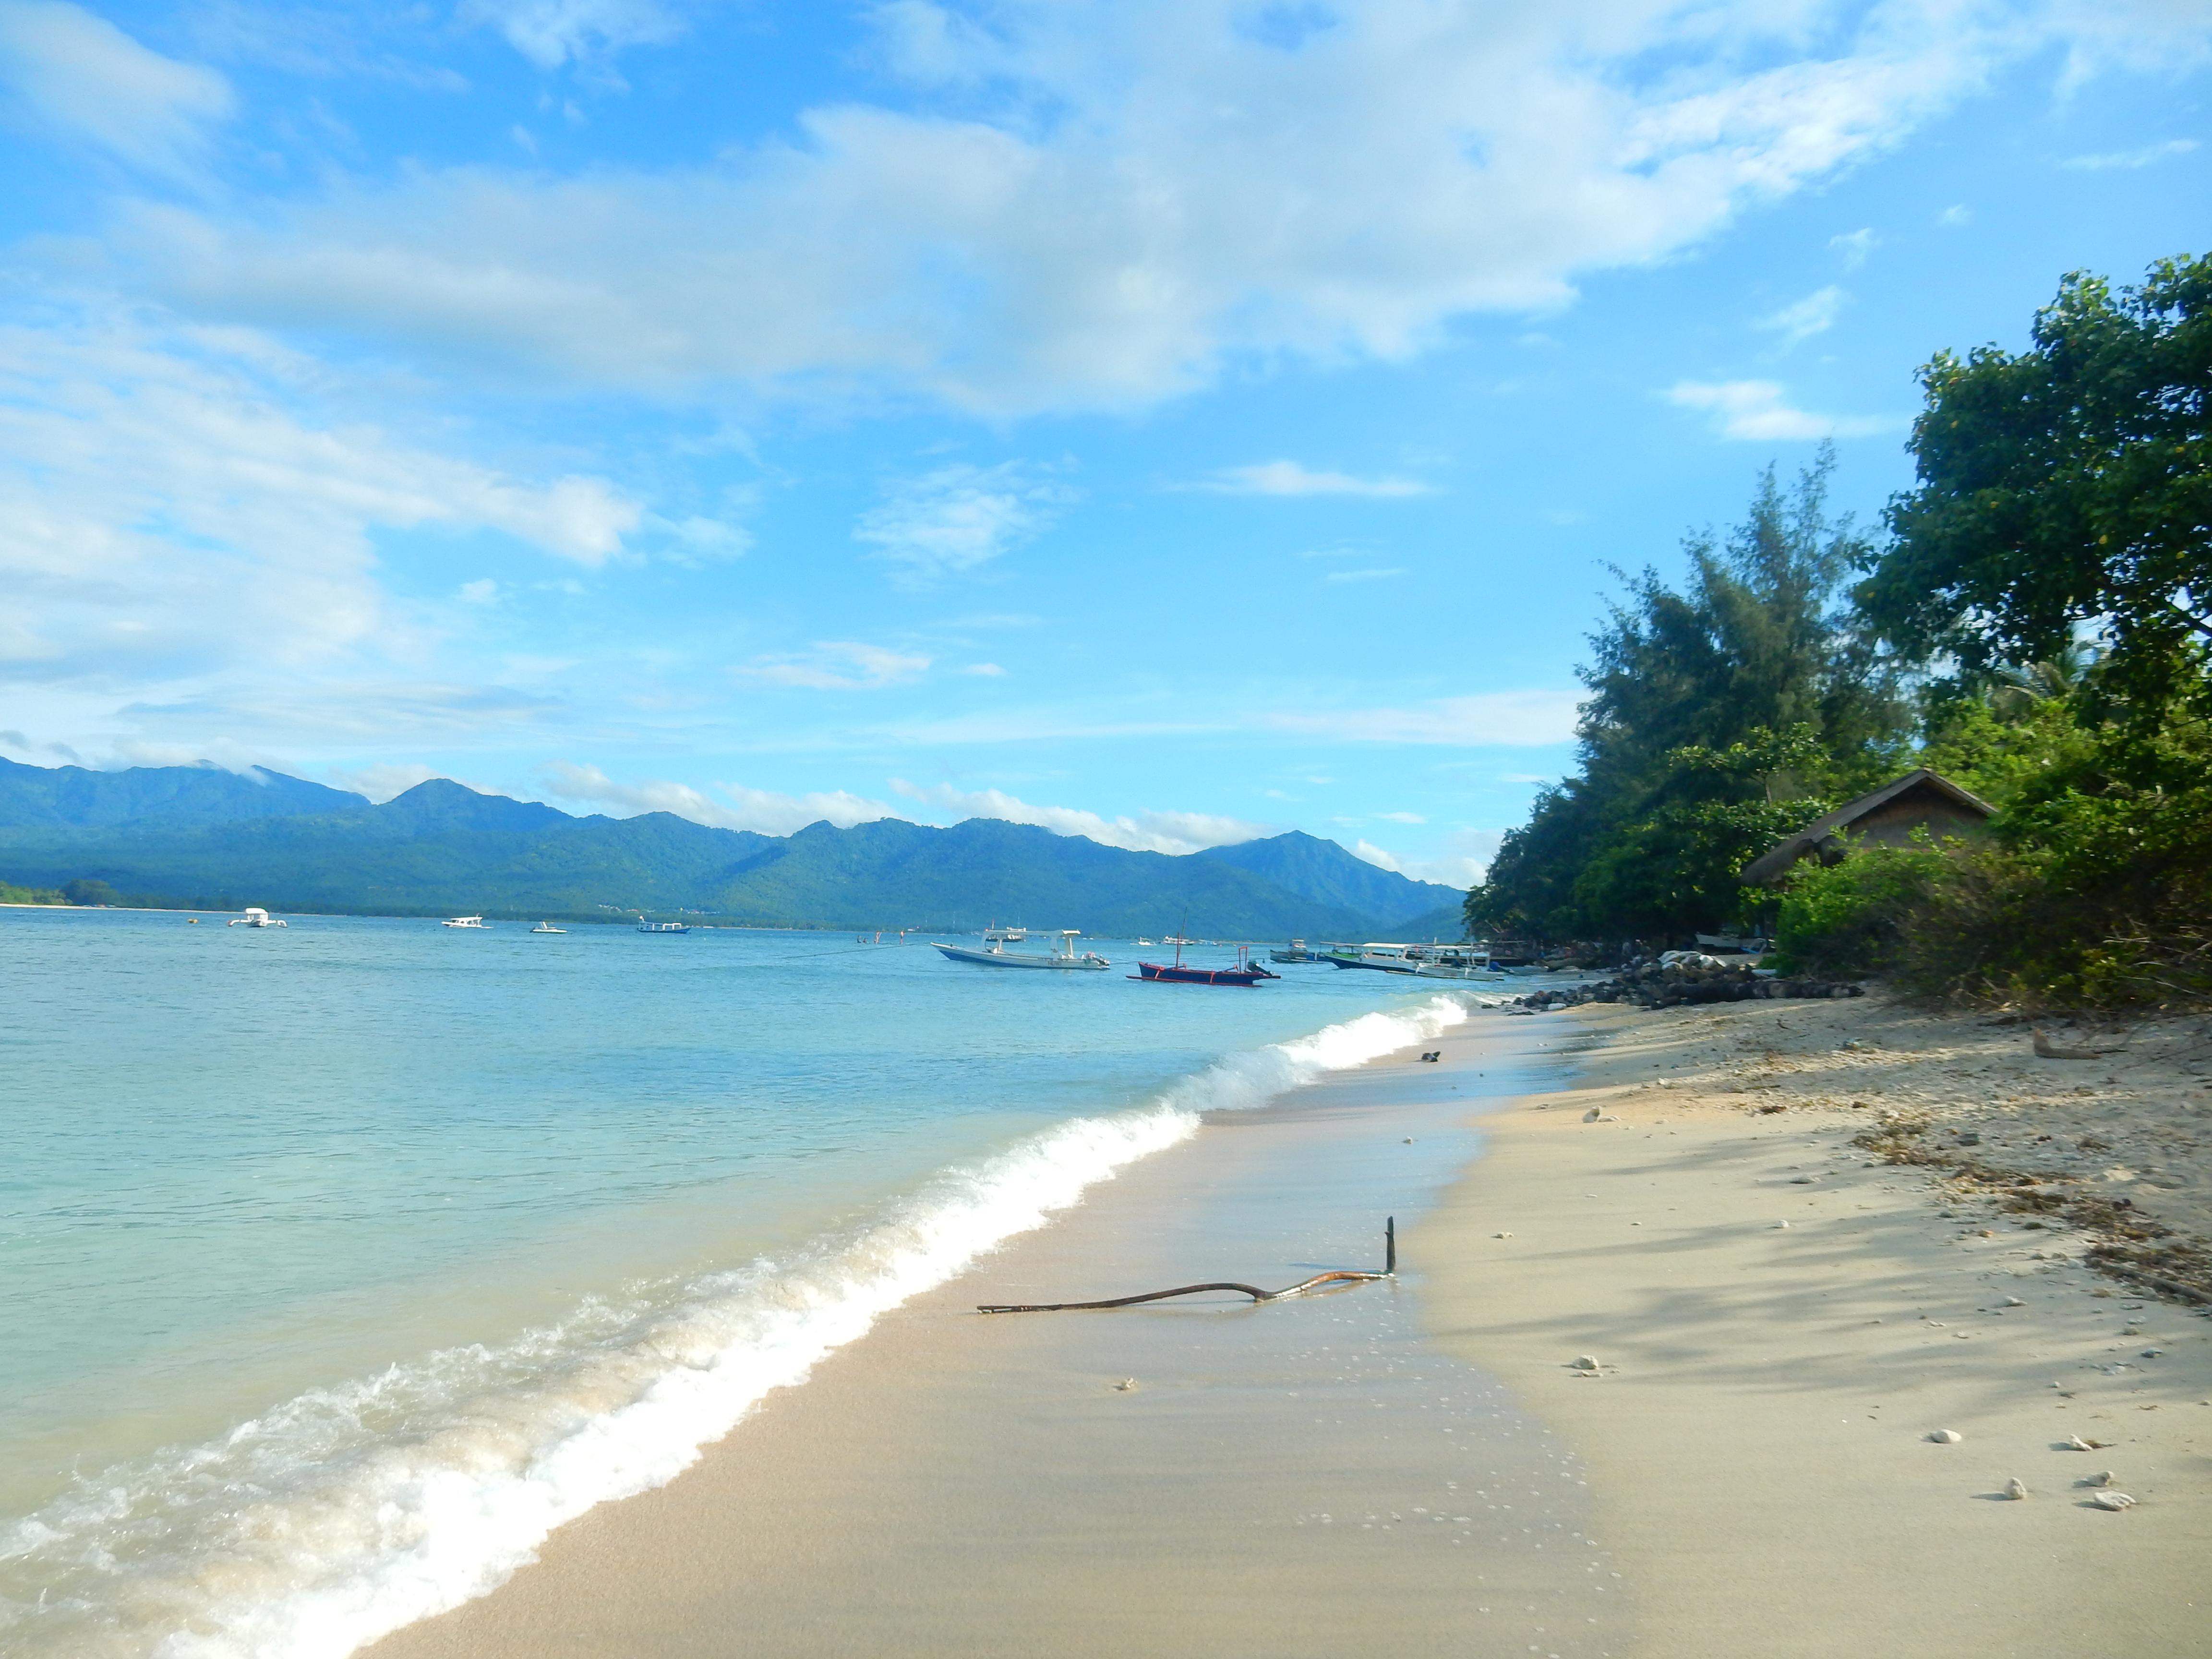 Plage de sable blanc, Gili Air, Indonésie